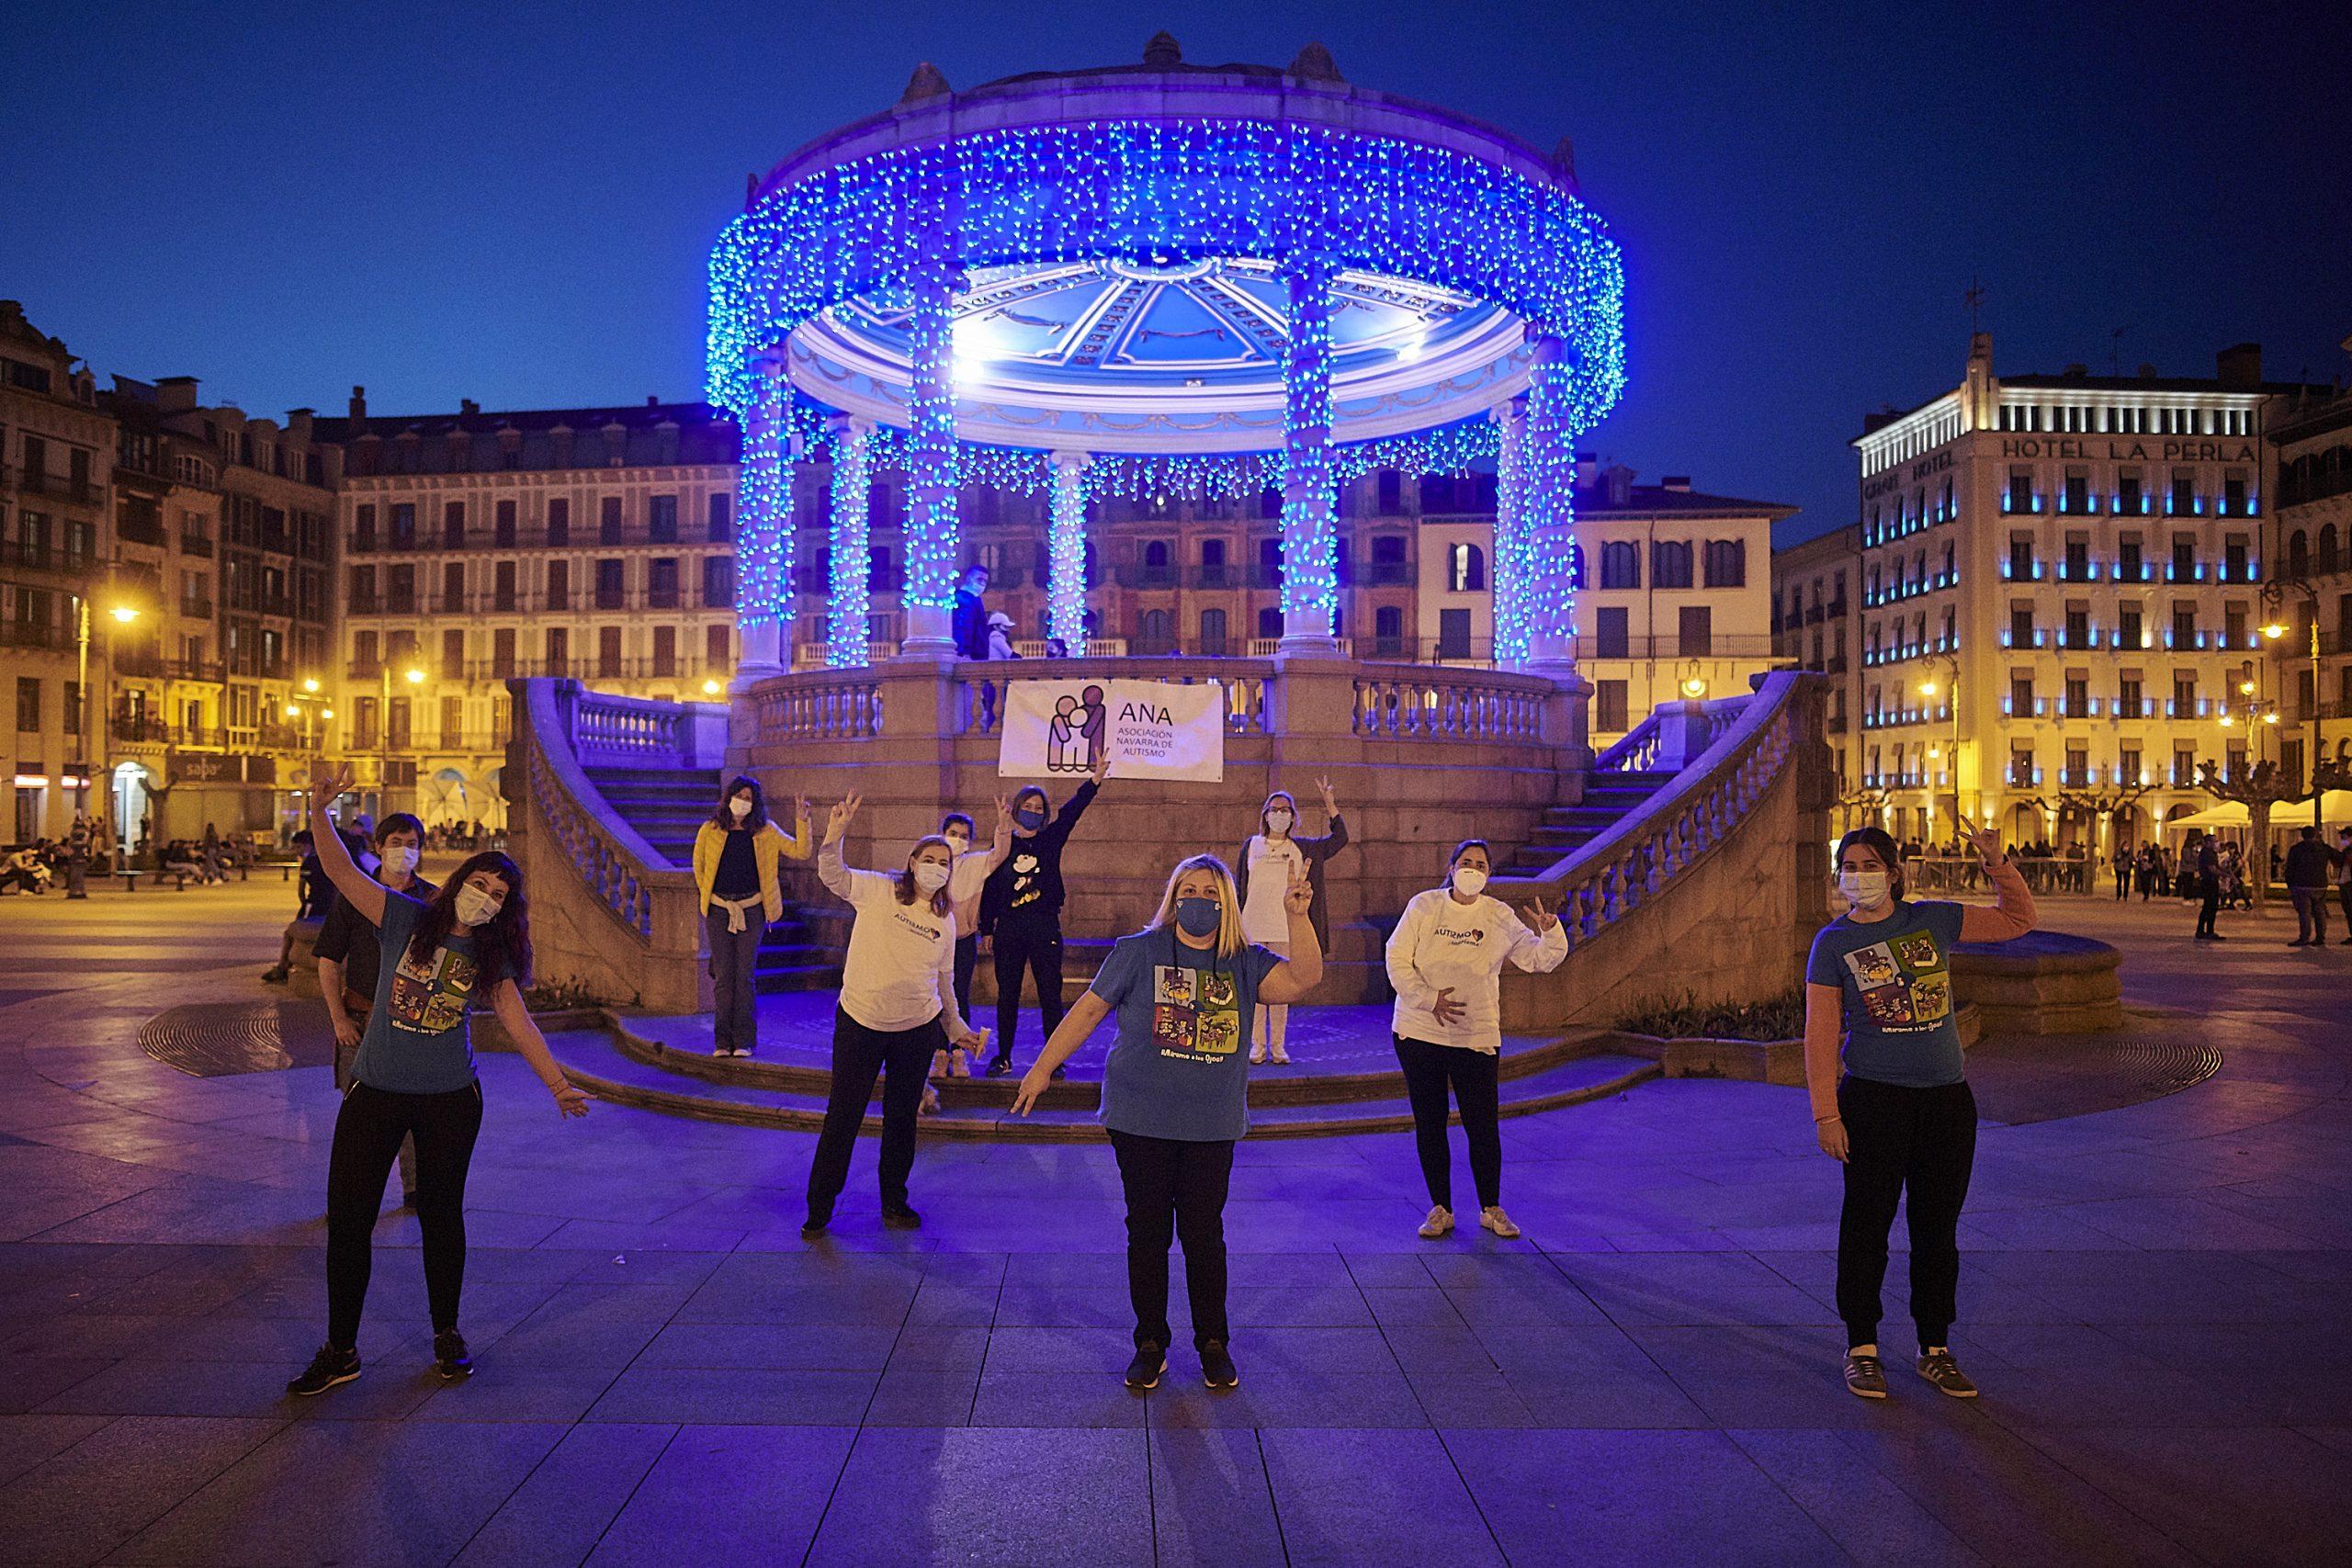 Integrantes de la Asociación ANA frente al kiosco de la Plaza del Castillo iluminado de azul